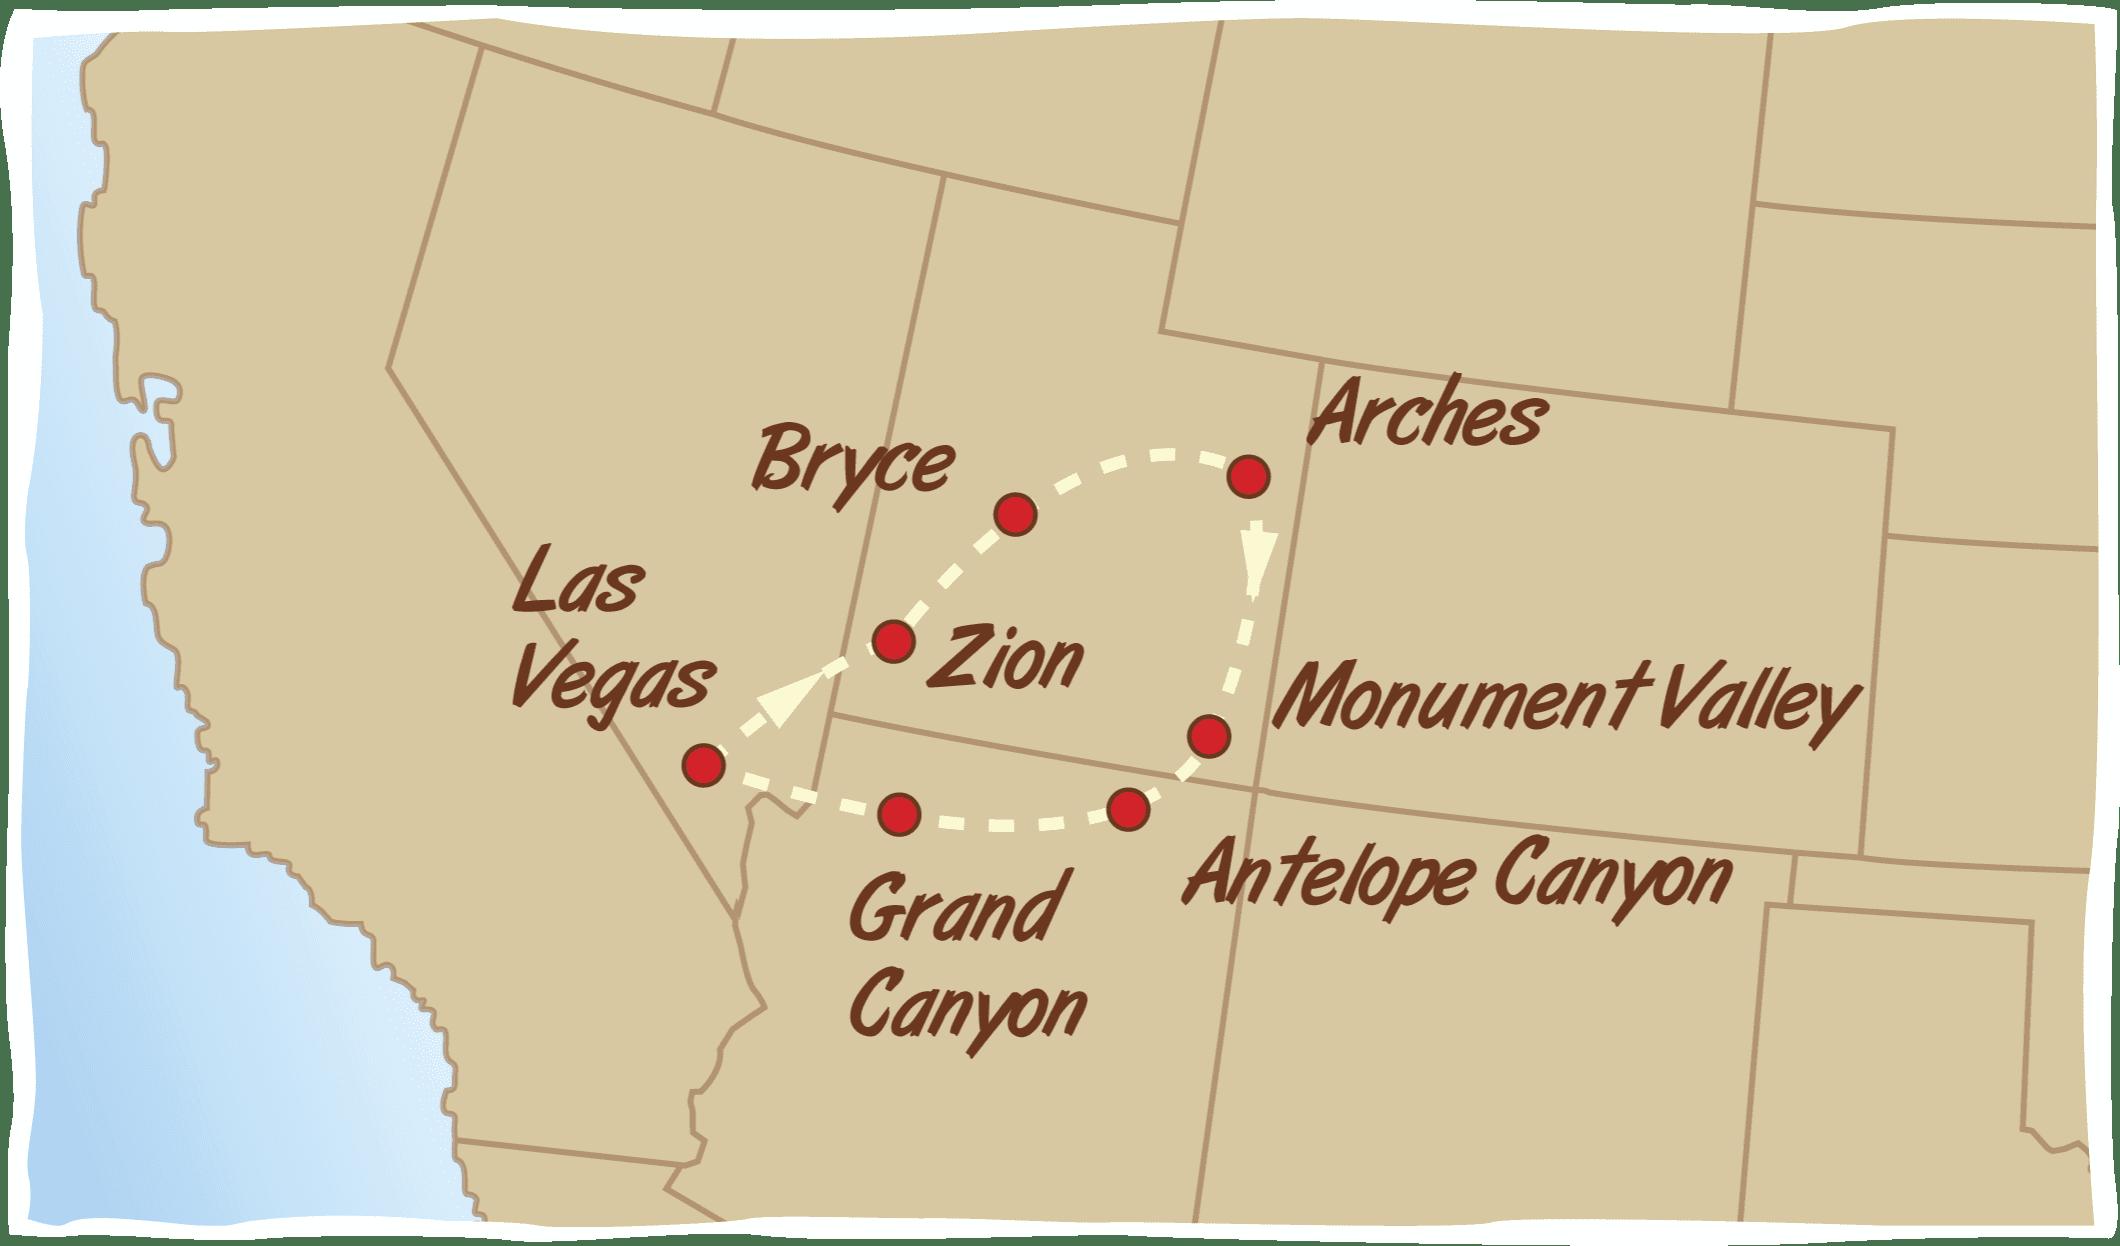 Canyons of the West Las Vegas – Green Tortoise Adventure Travel on map of arizona az, map of colorado river az, map of monument valley az, map of black mesa az, map of phoenix az, map of tombstone az, map of cameron az, map of shiprock az, map of jerome az, map of page az, map of tucson az, map of flagstaff az, map of painted desert az, map of wyoming az, map of bryce az, map of petrified forest az, map of havasupai falls az, map of west clear creek wilderness az, map of coyote buttes az, map of navajo az,